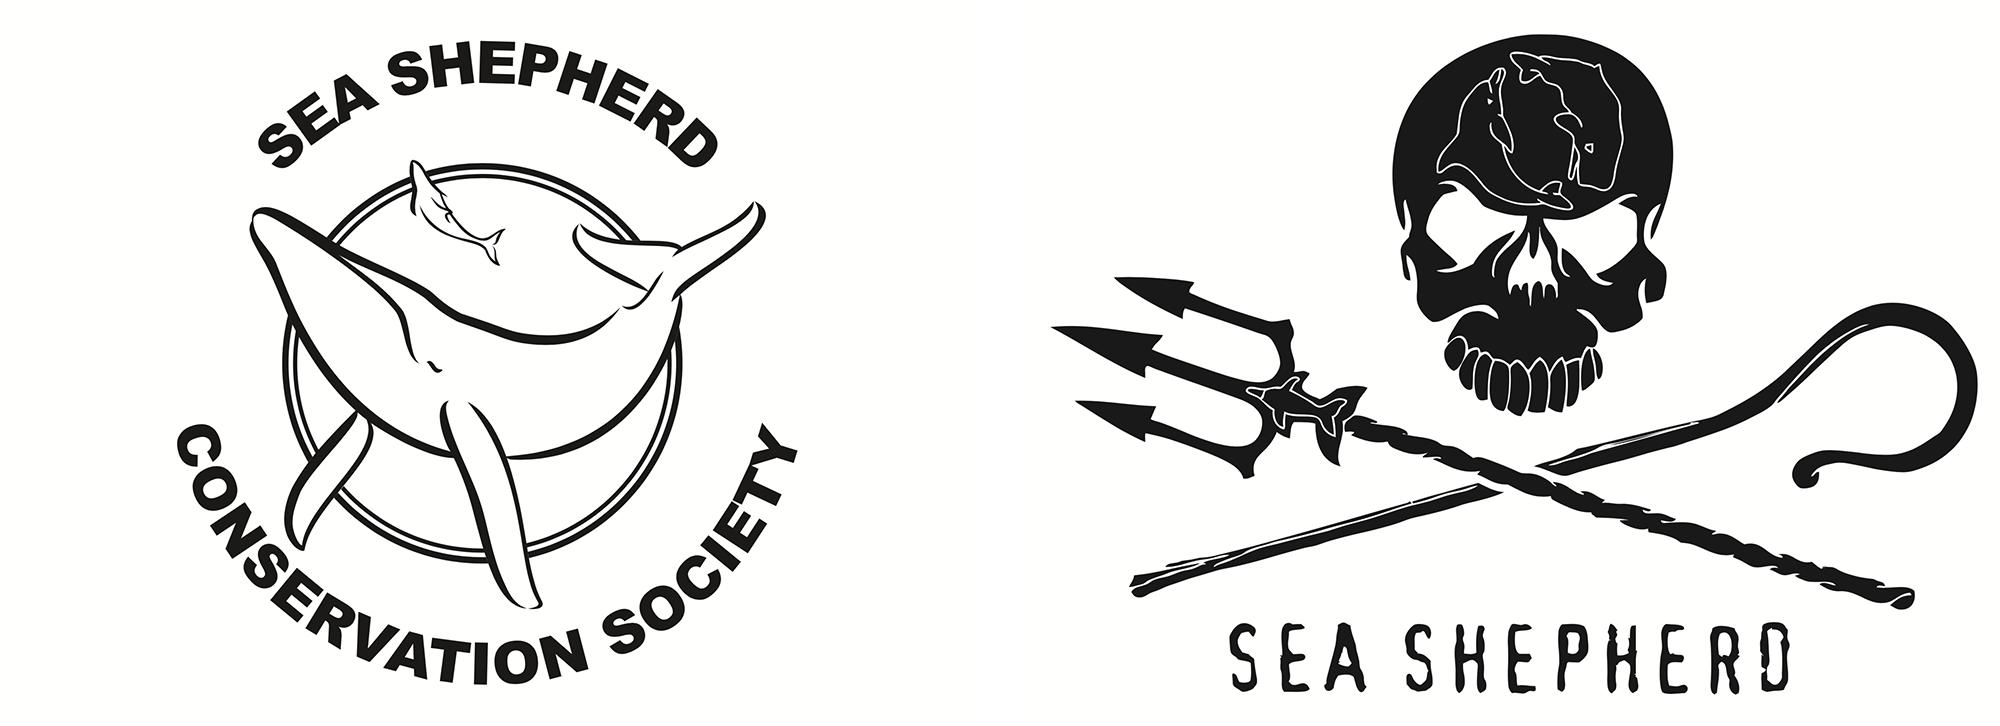 sea-shepherd-graphic-design